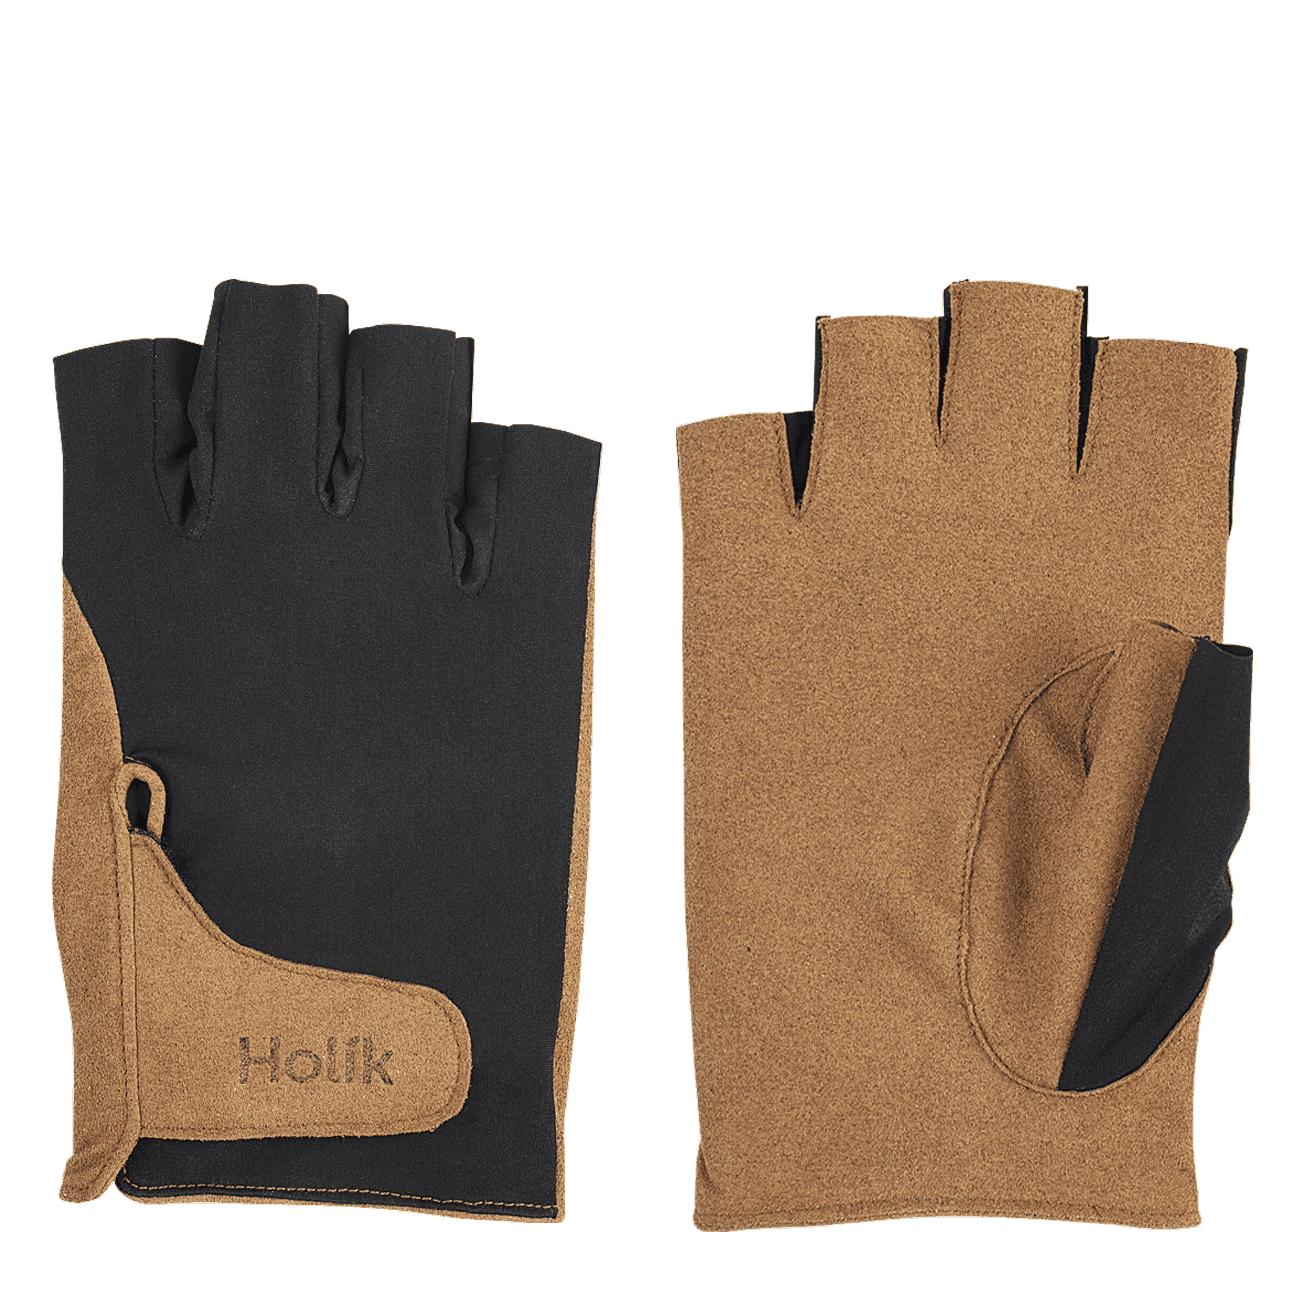 Holik Gloves Jessica 8386